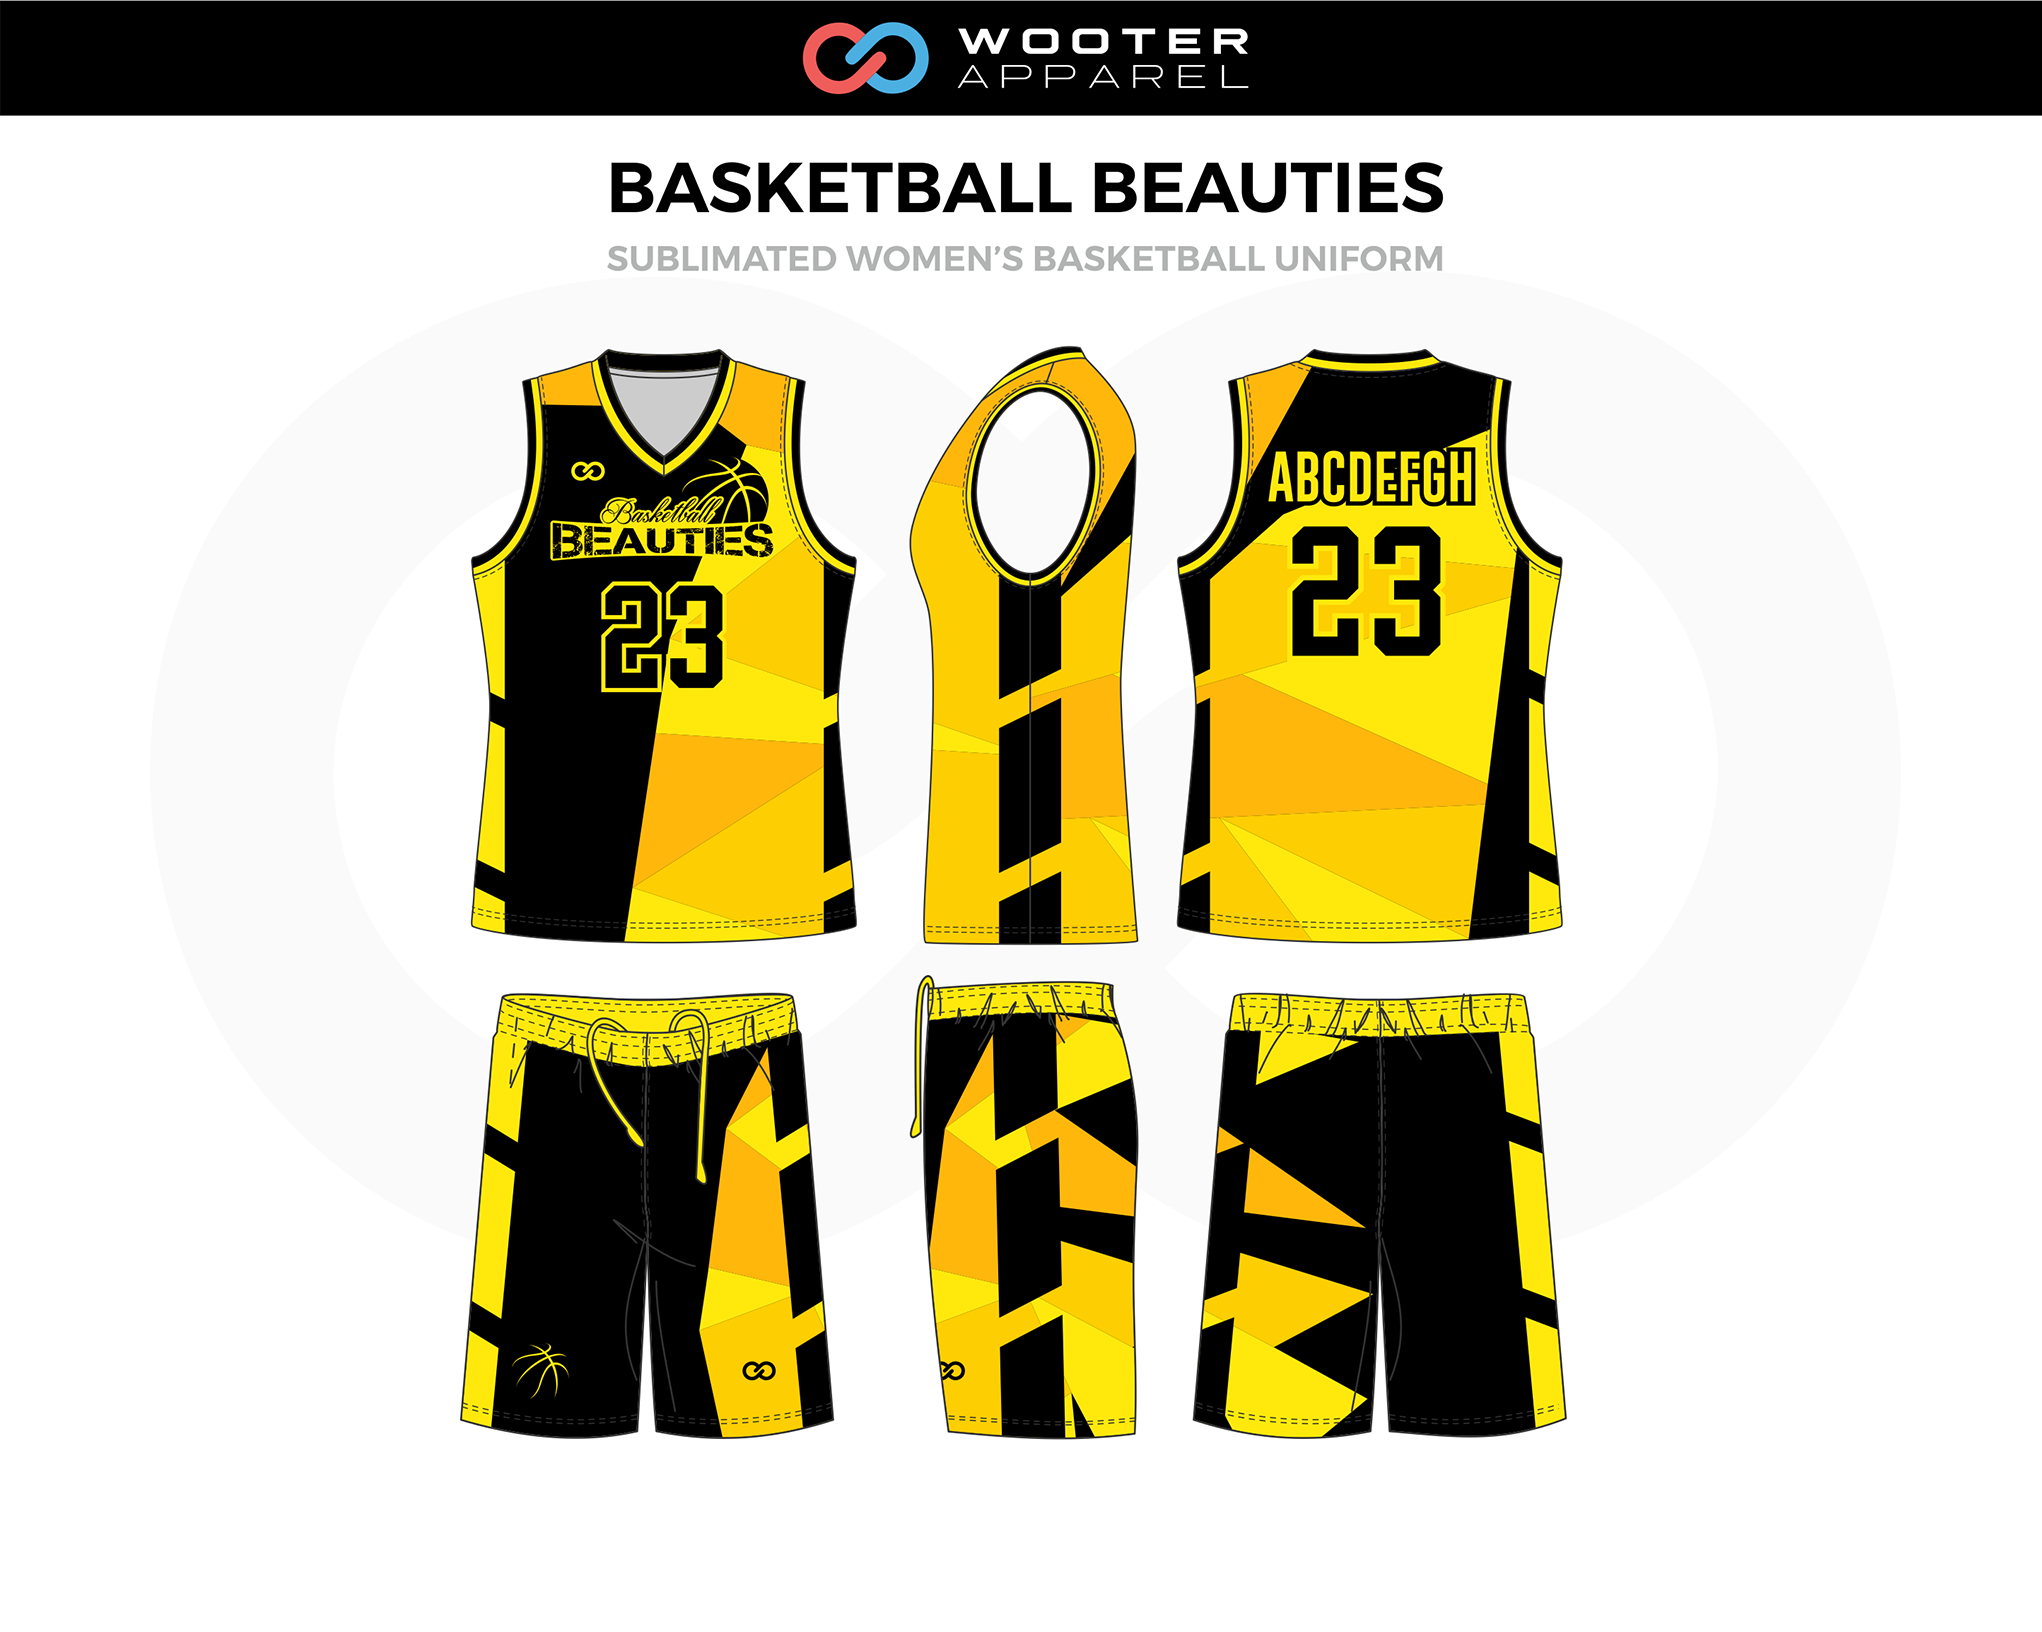 05_Basketball Beauties v2.png